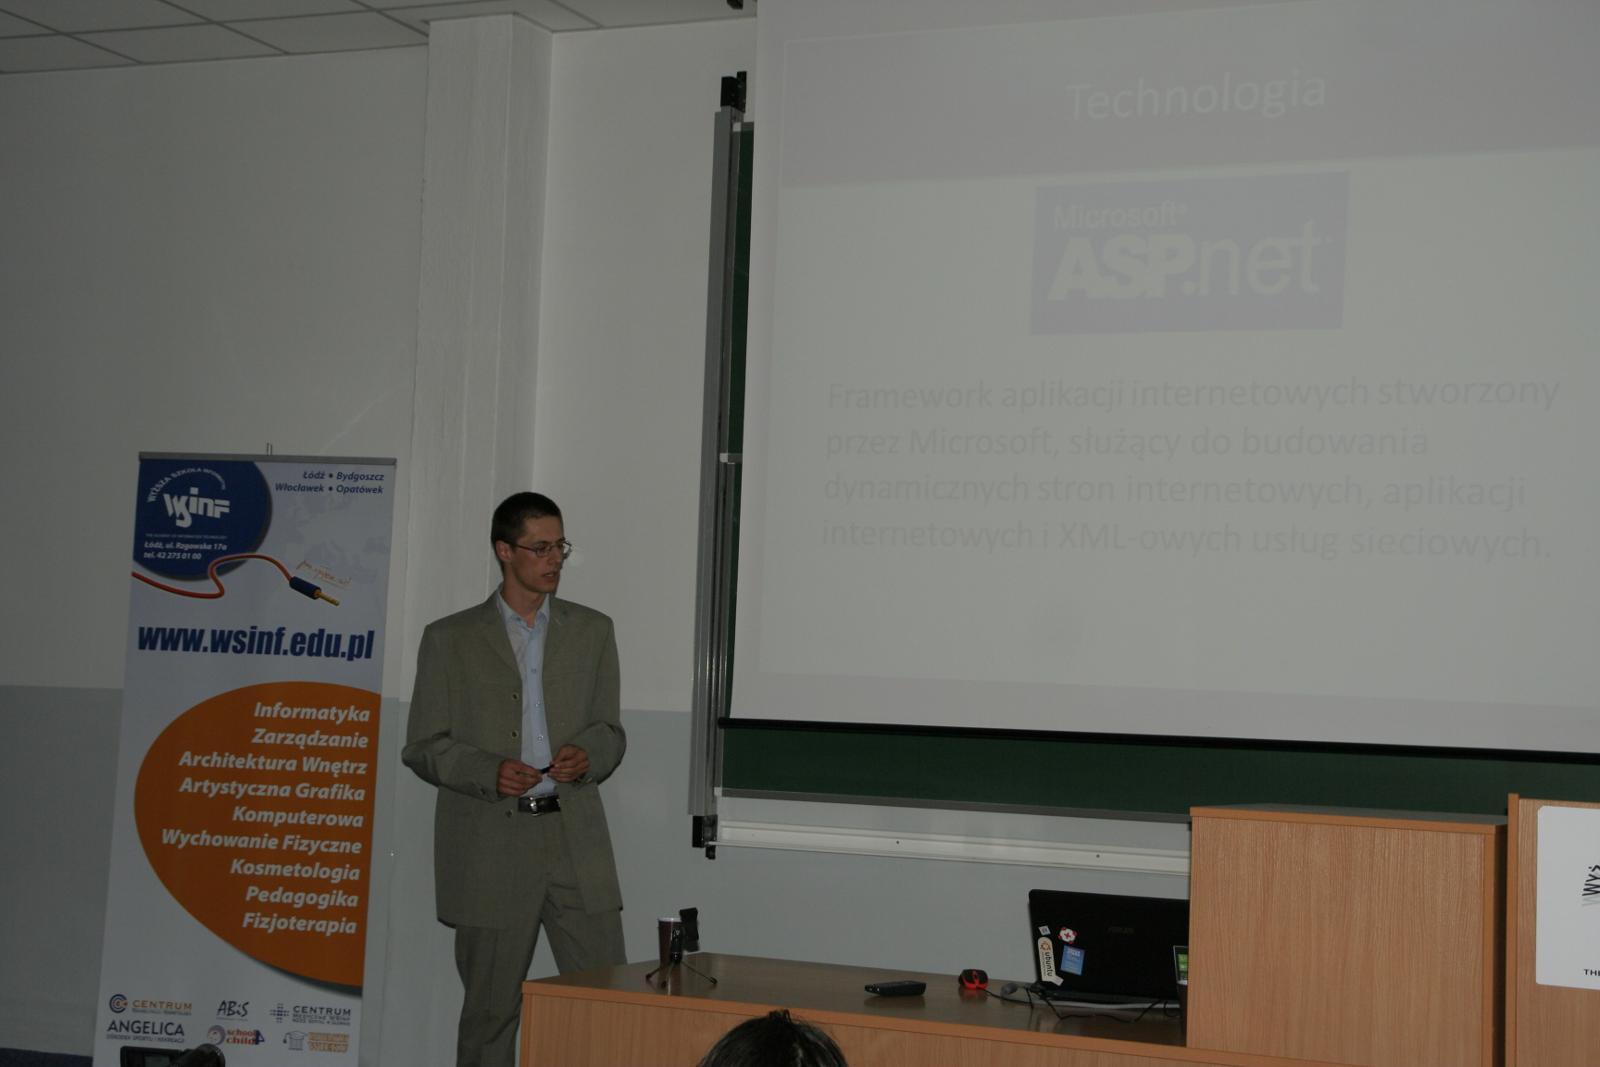 Wieczór z Open Source 2011